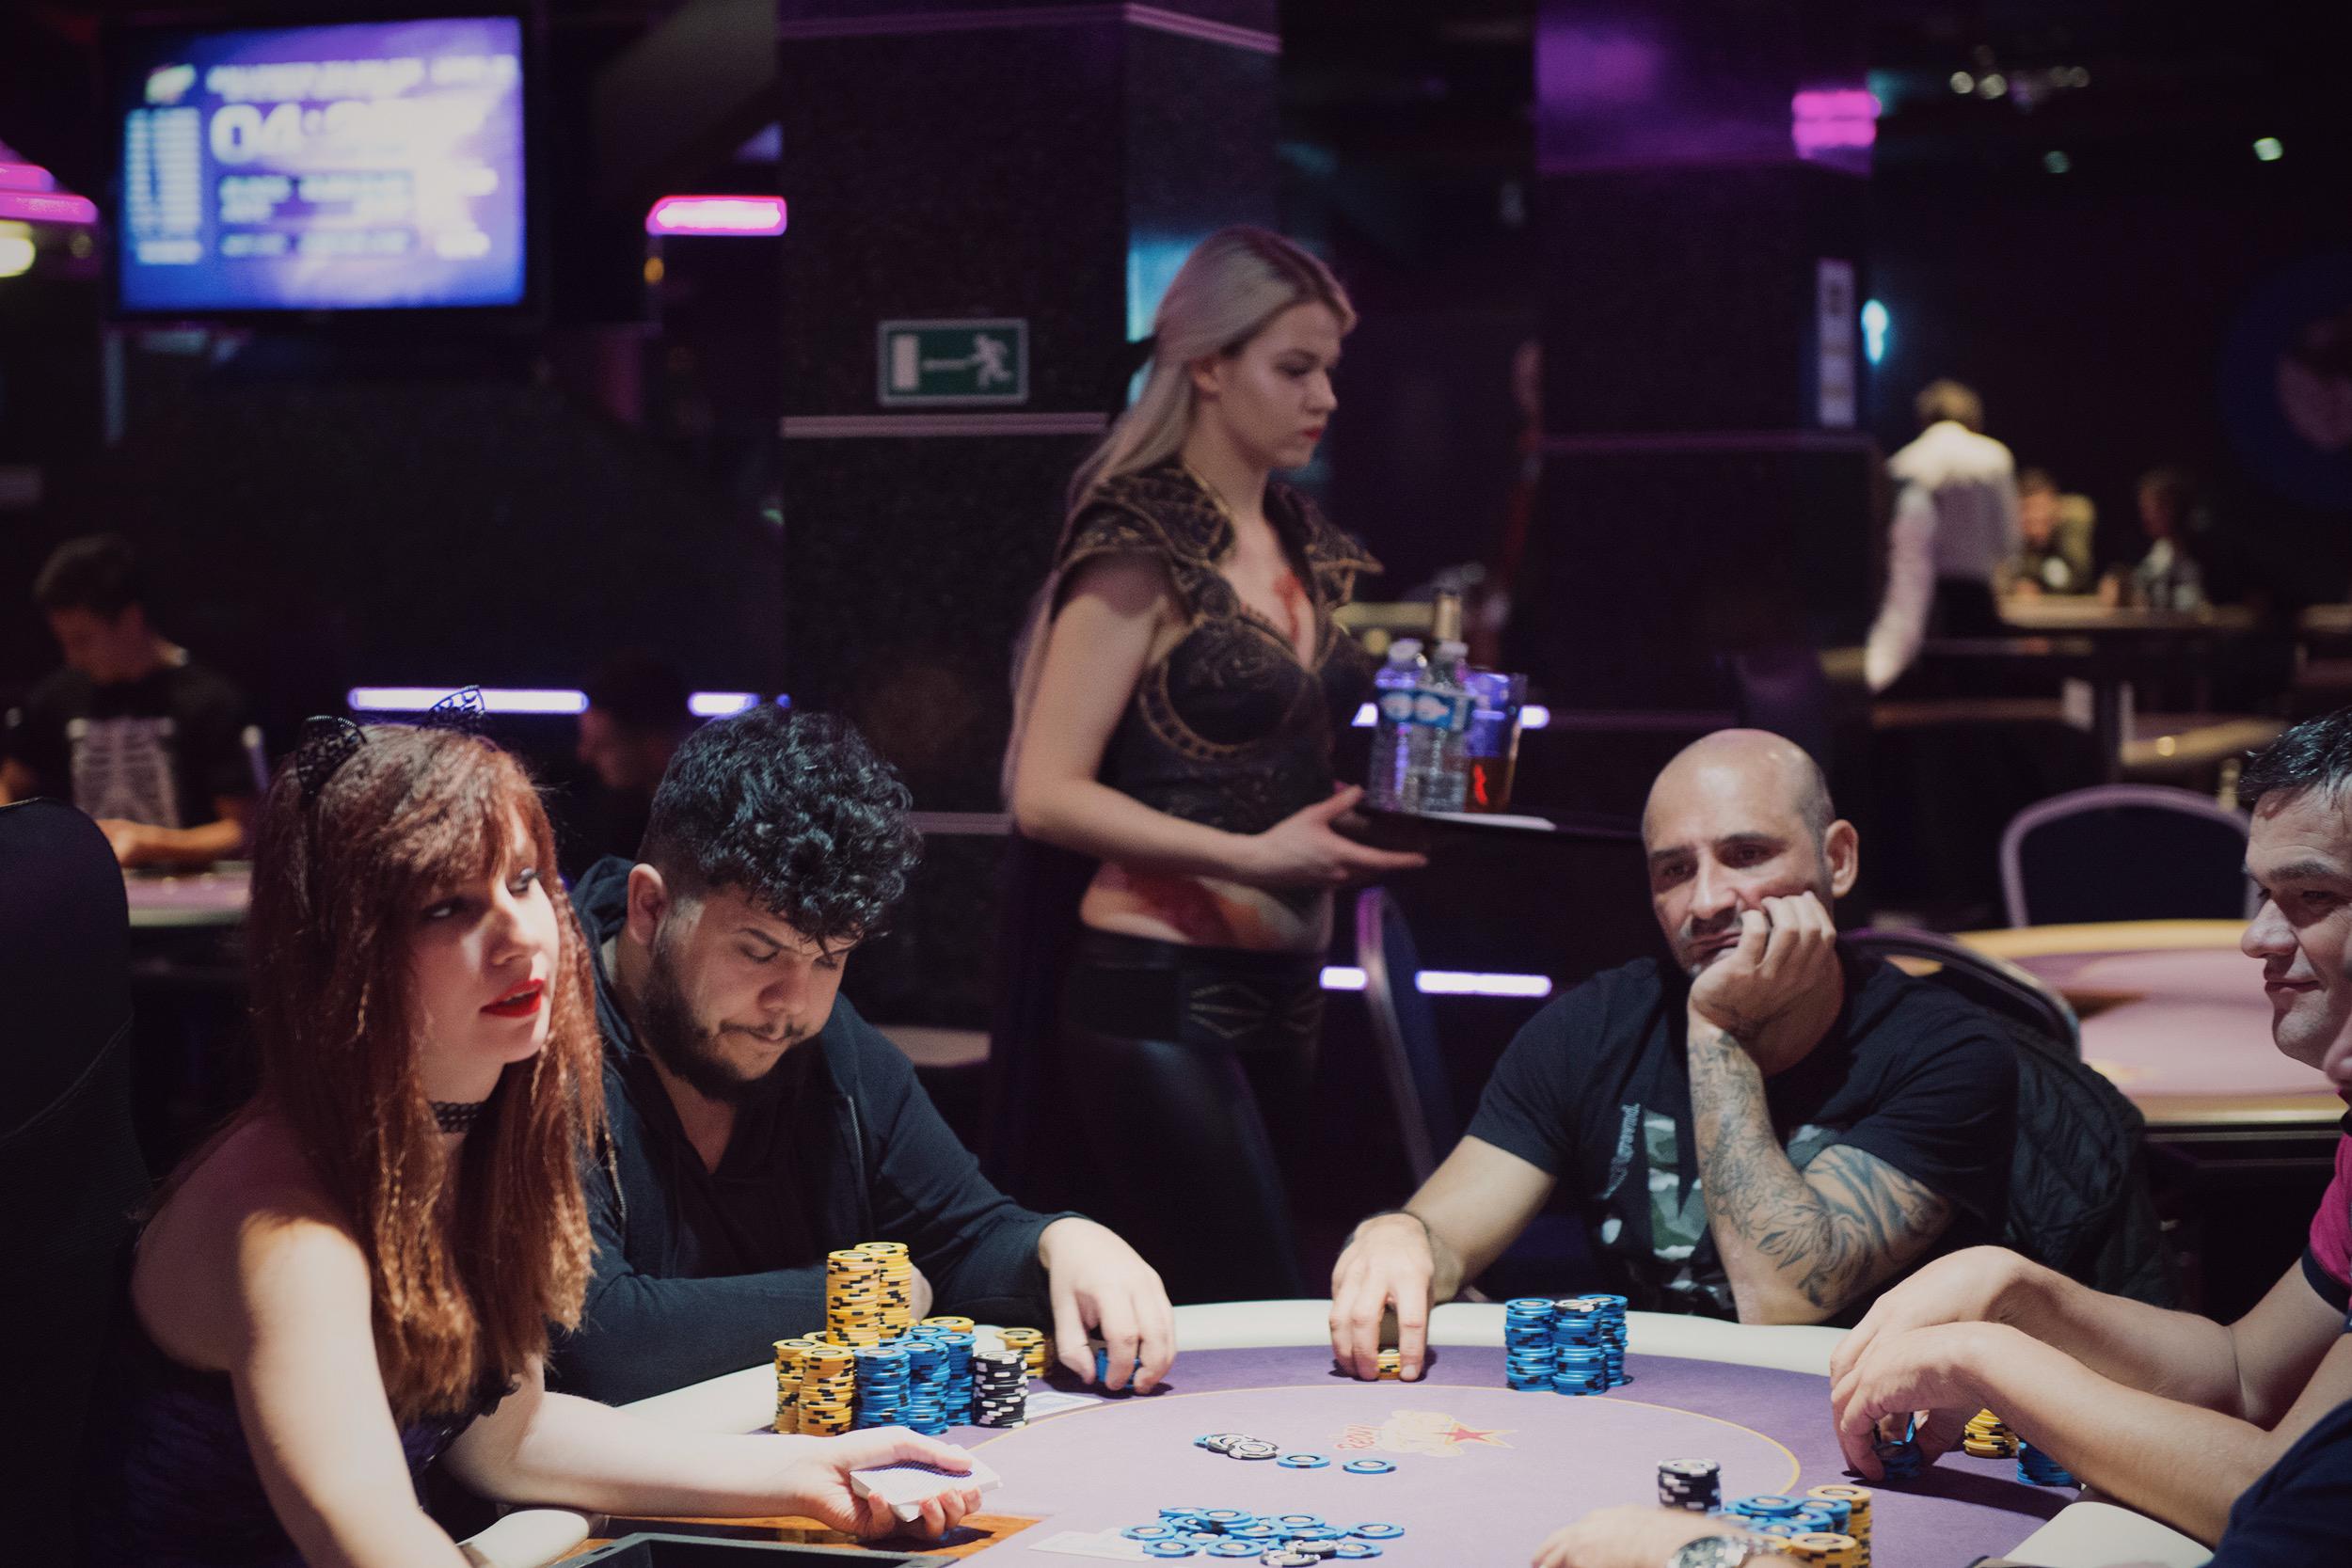 Poker-Photography-Europe-Polina-Shubkina-Casino-RebuyStars-009.JPG